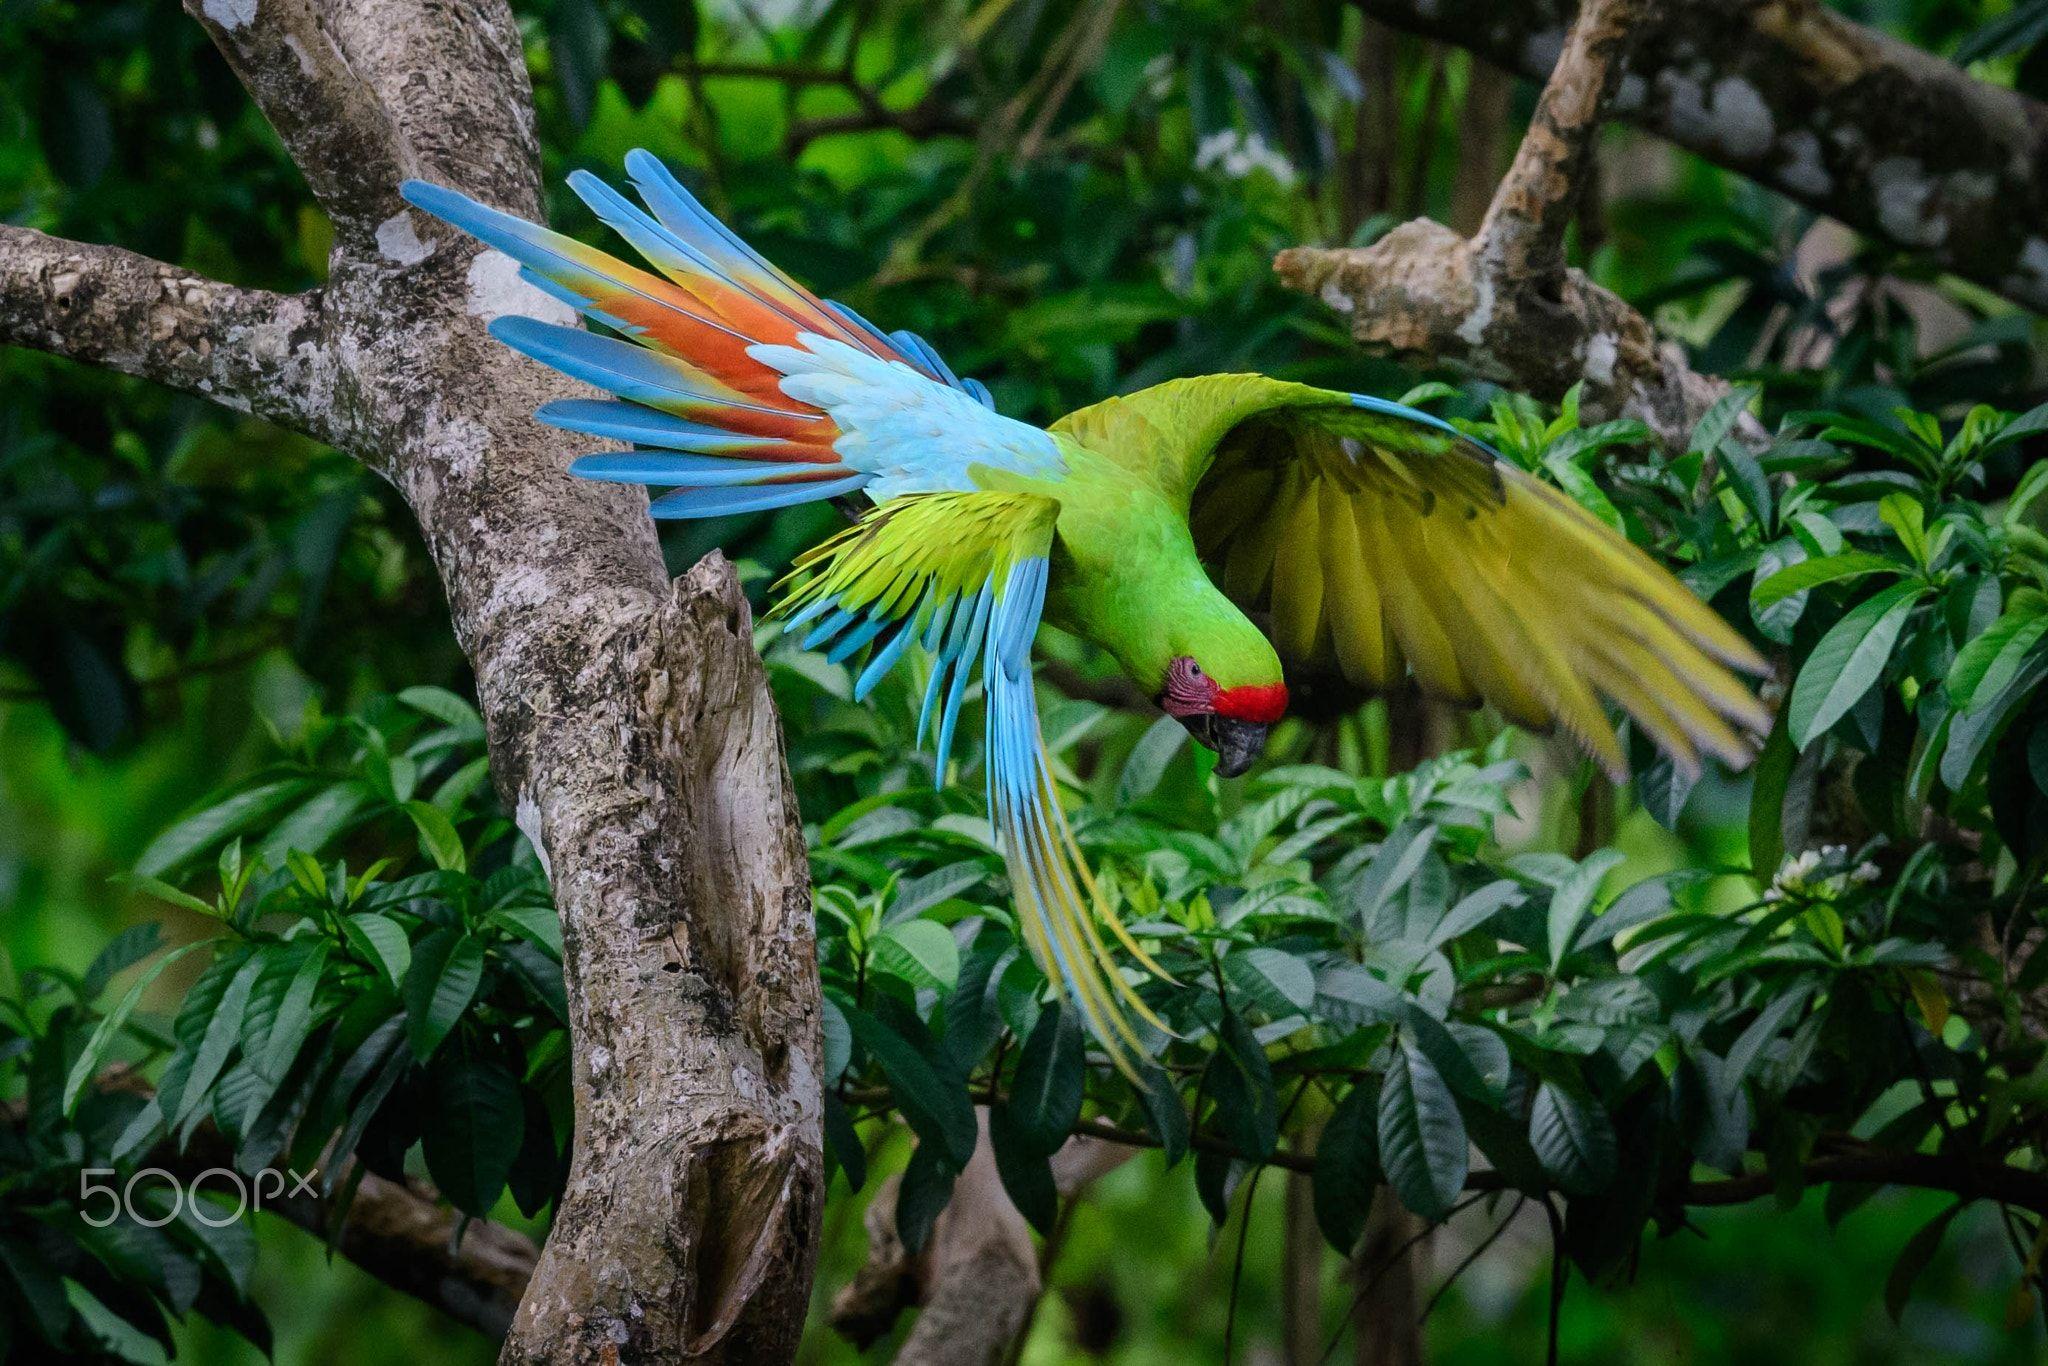 Great Green Macaw in Costa Rica - Great Green Macaw in Manzanillo, Costa Rica